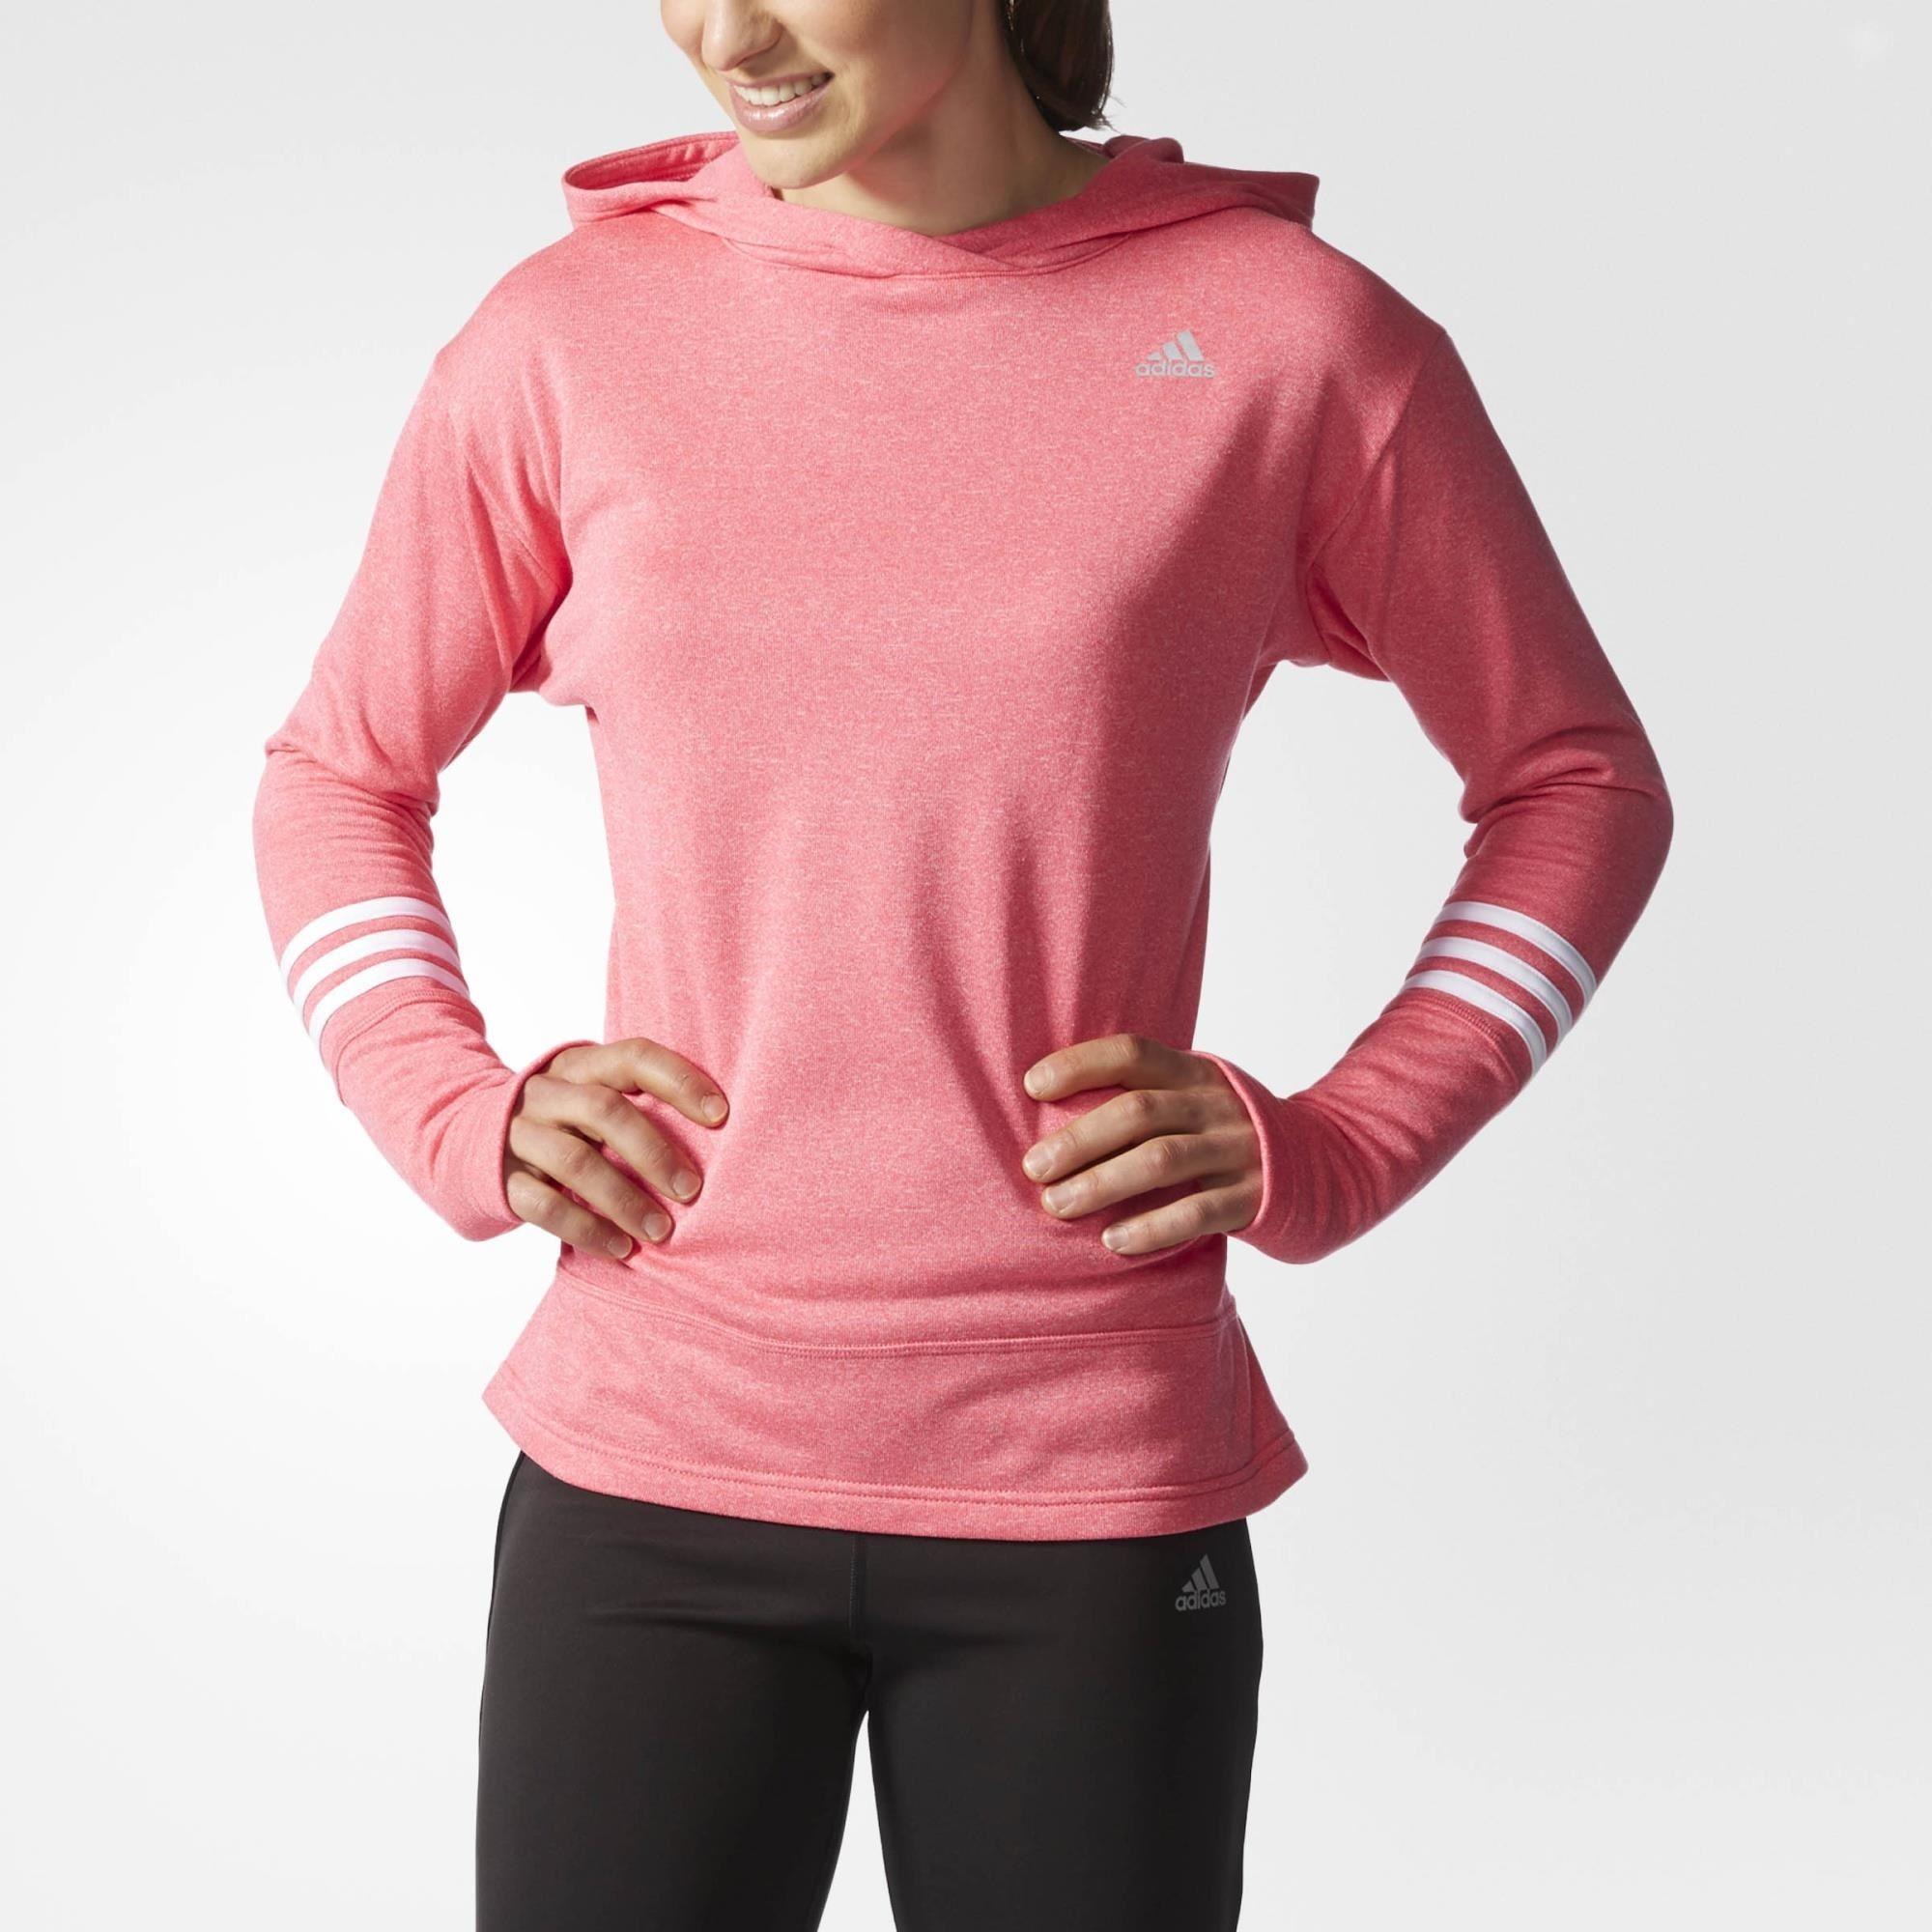 adidas Sudadera con Gorro para Correr Response Icon Mujer - Pink ... fbe0e742833af